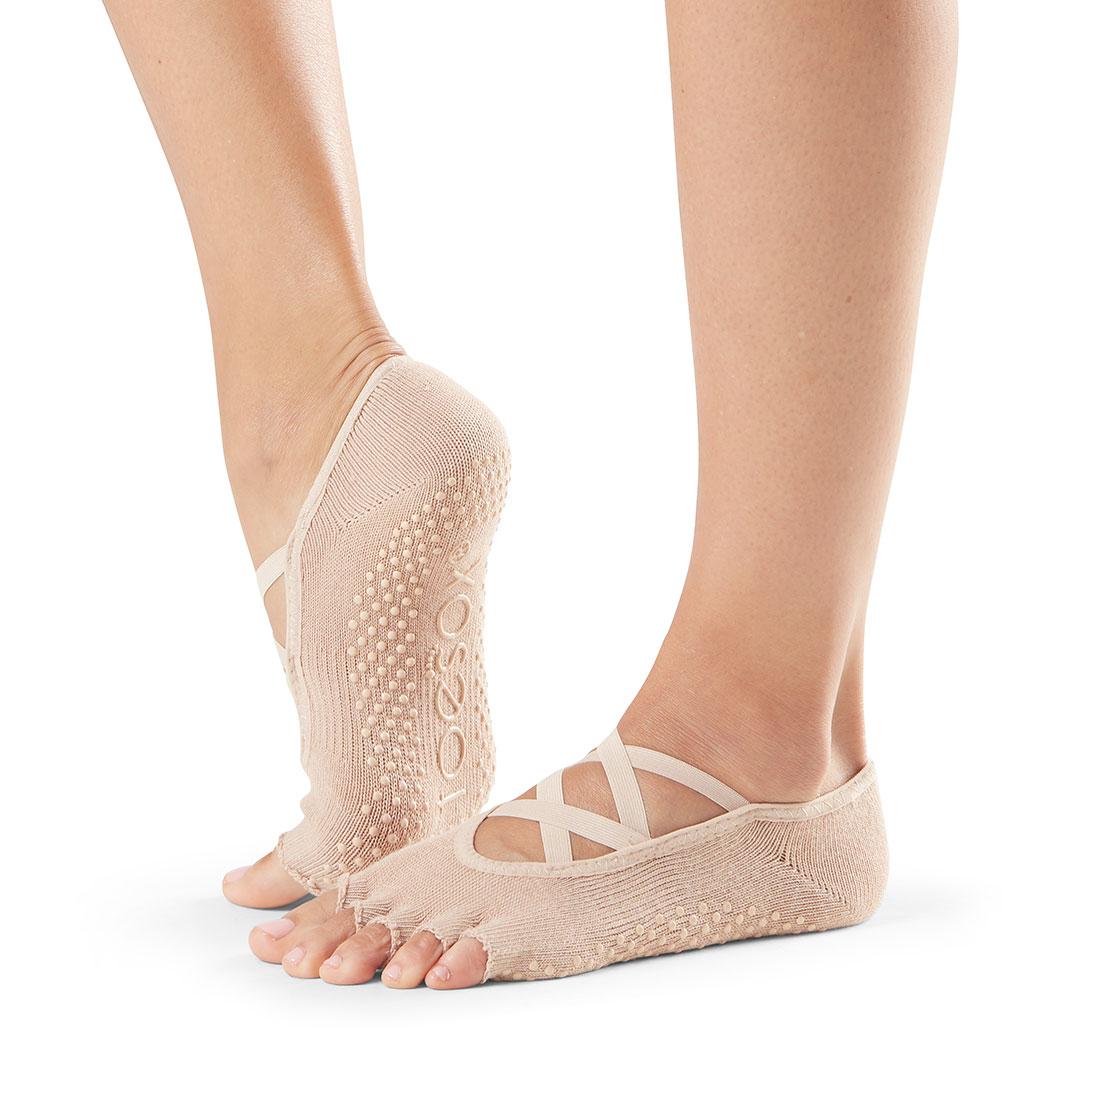 Yogasocken ToeSox Elle Half Toe Nude